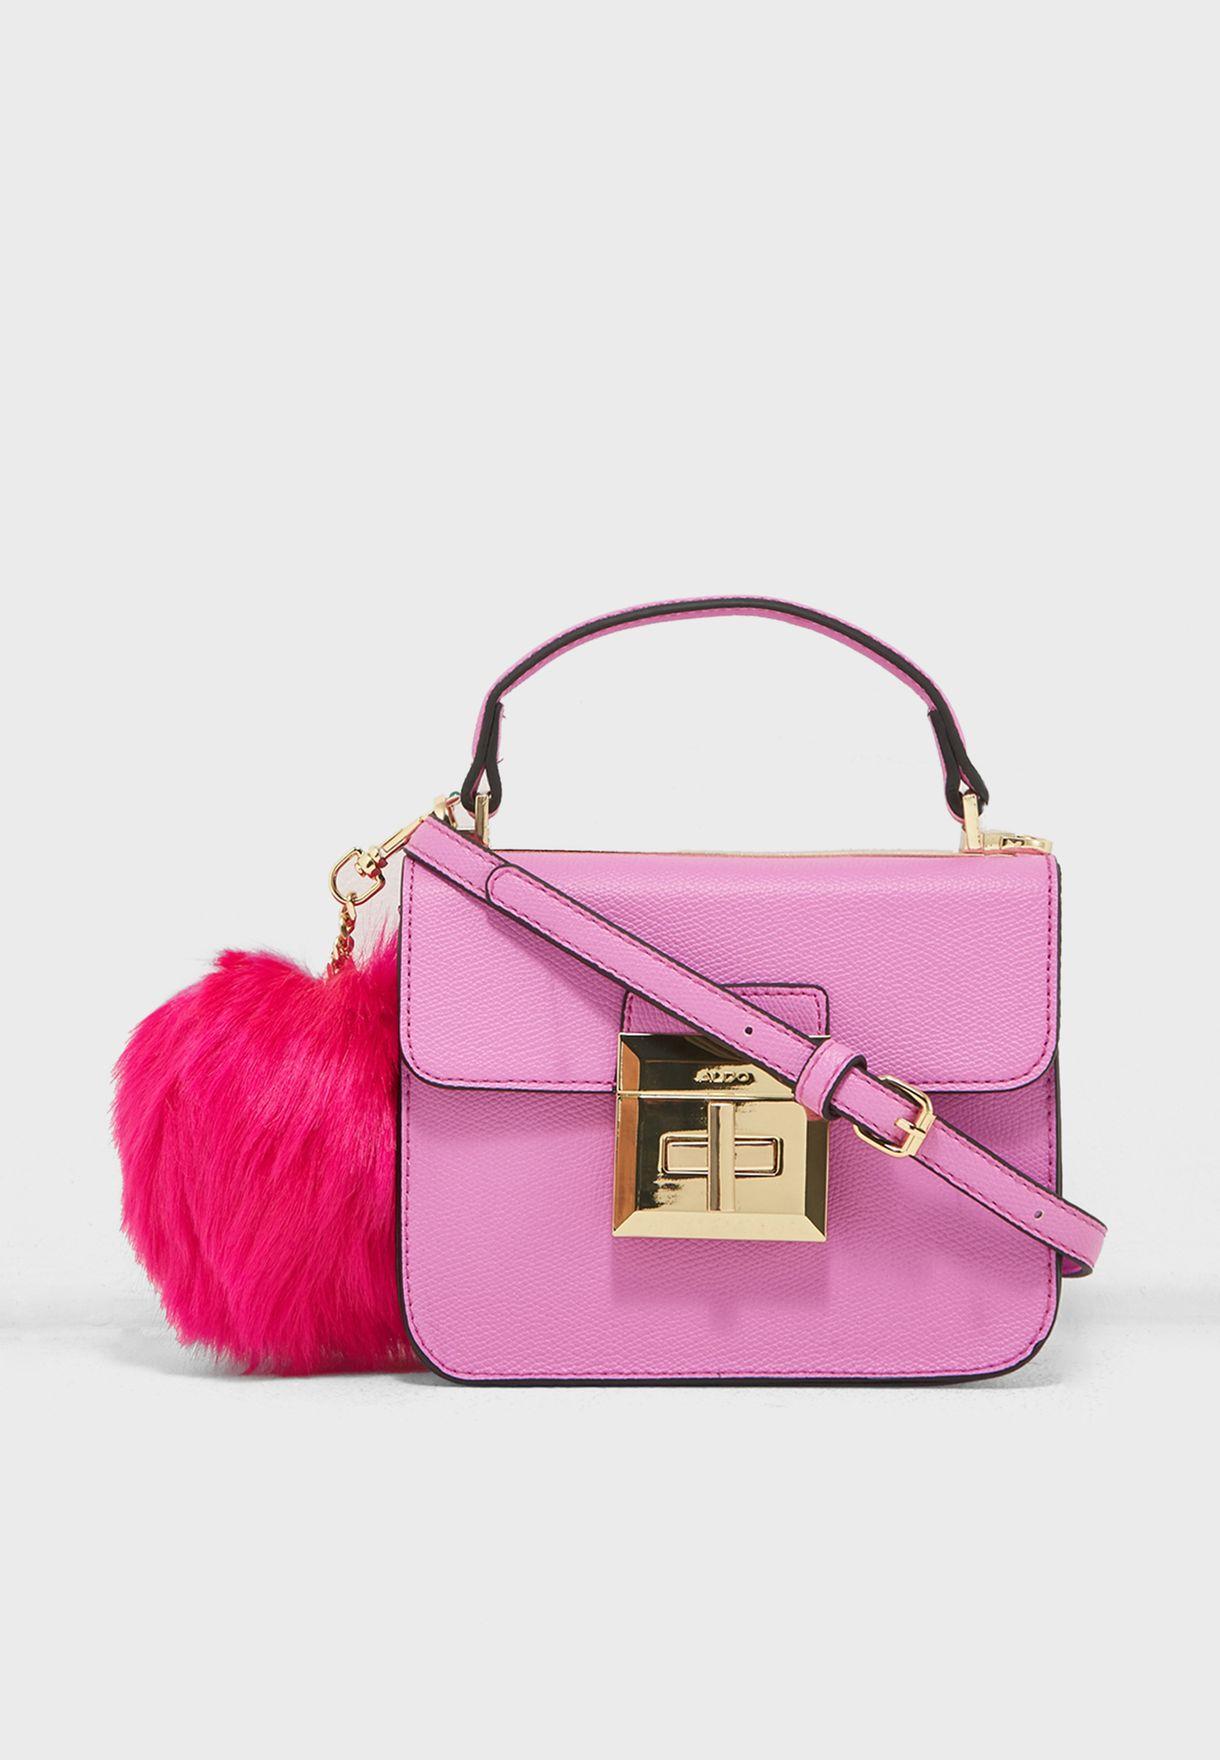 e43721edcc7 Shop Aldo pink Chiadda Mini Pom Pom Satchel CHIADDA53 for Women in ...